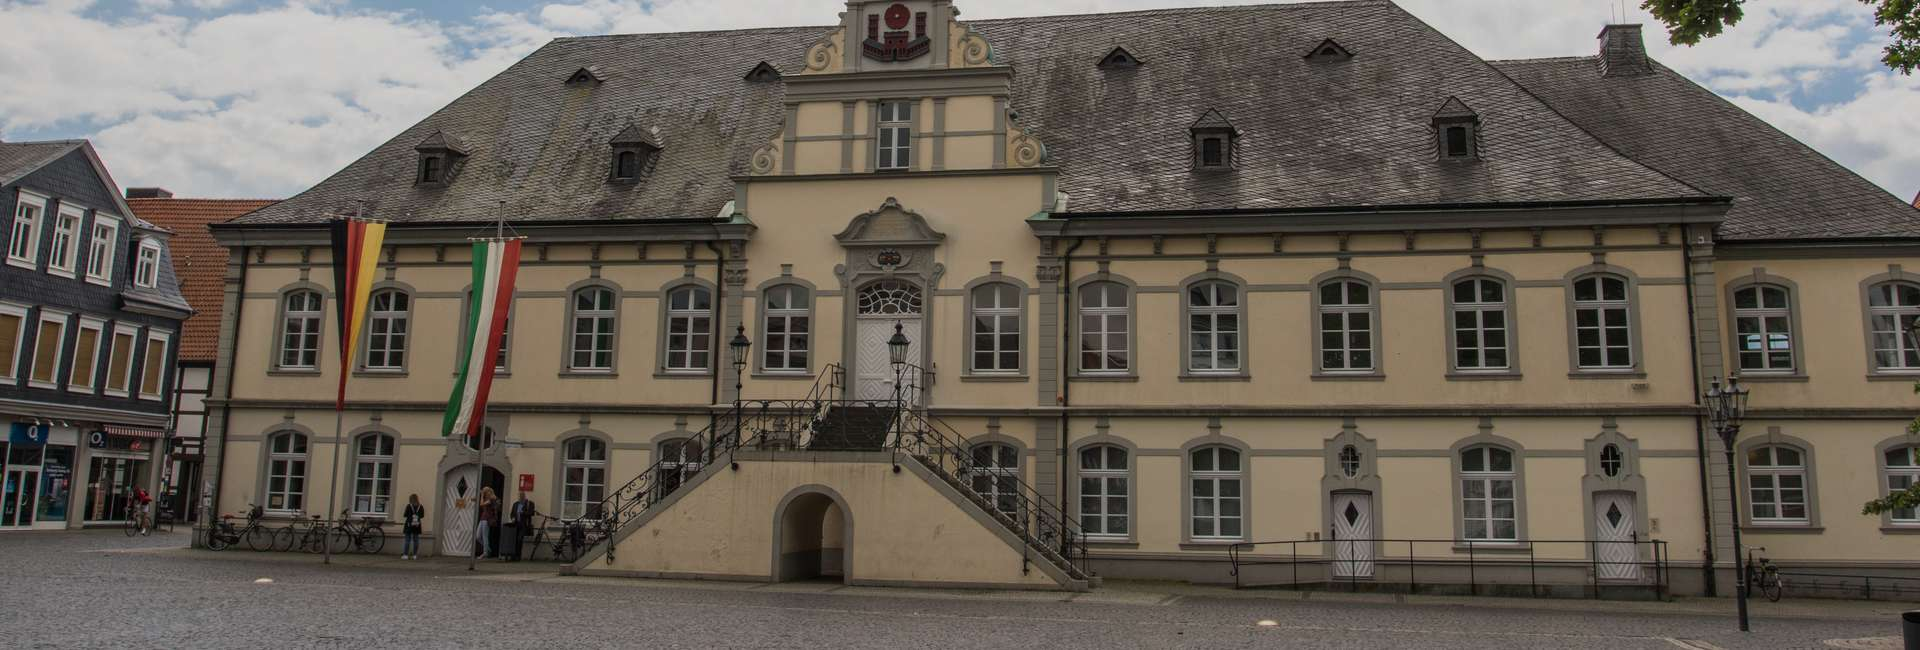 Umzuege-Lippstadt-CNolte-Umzugsunternehmen